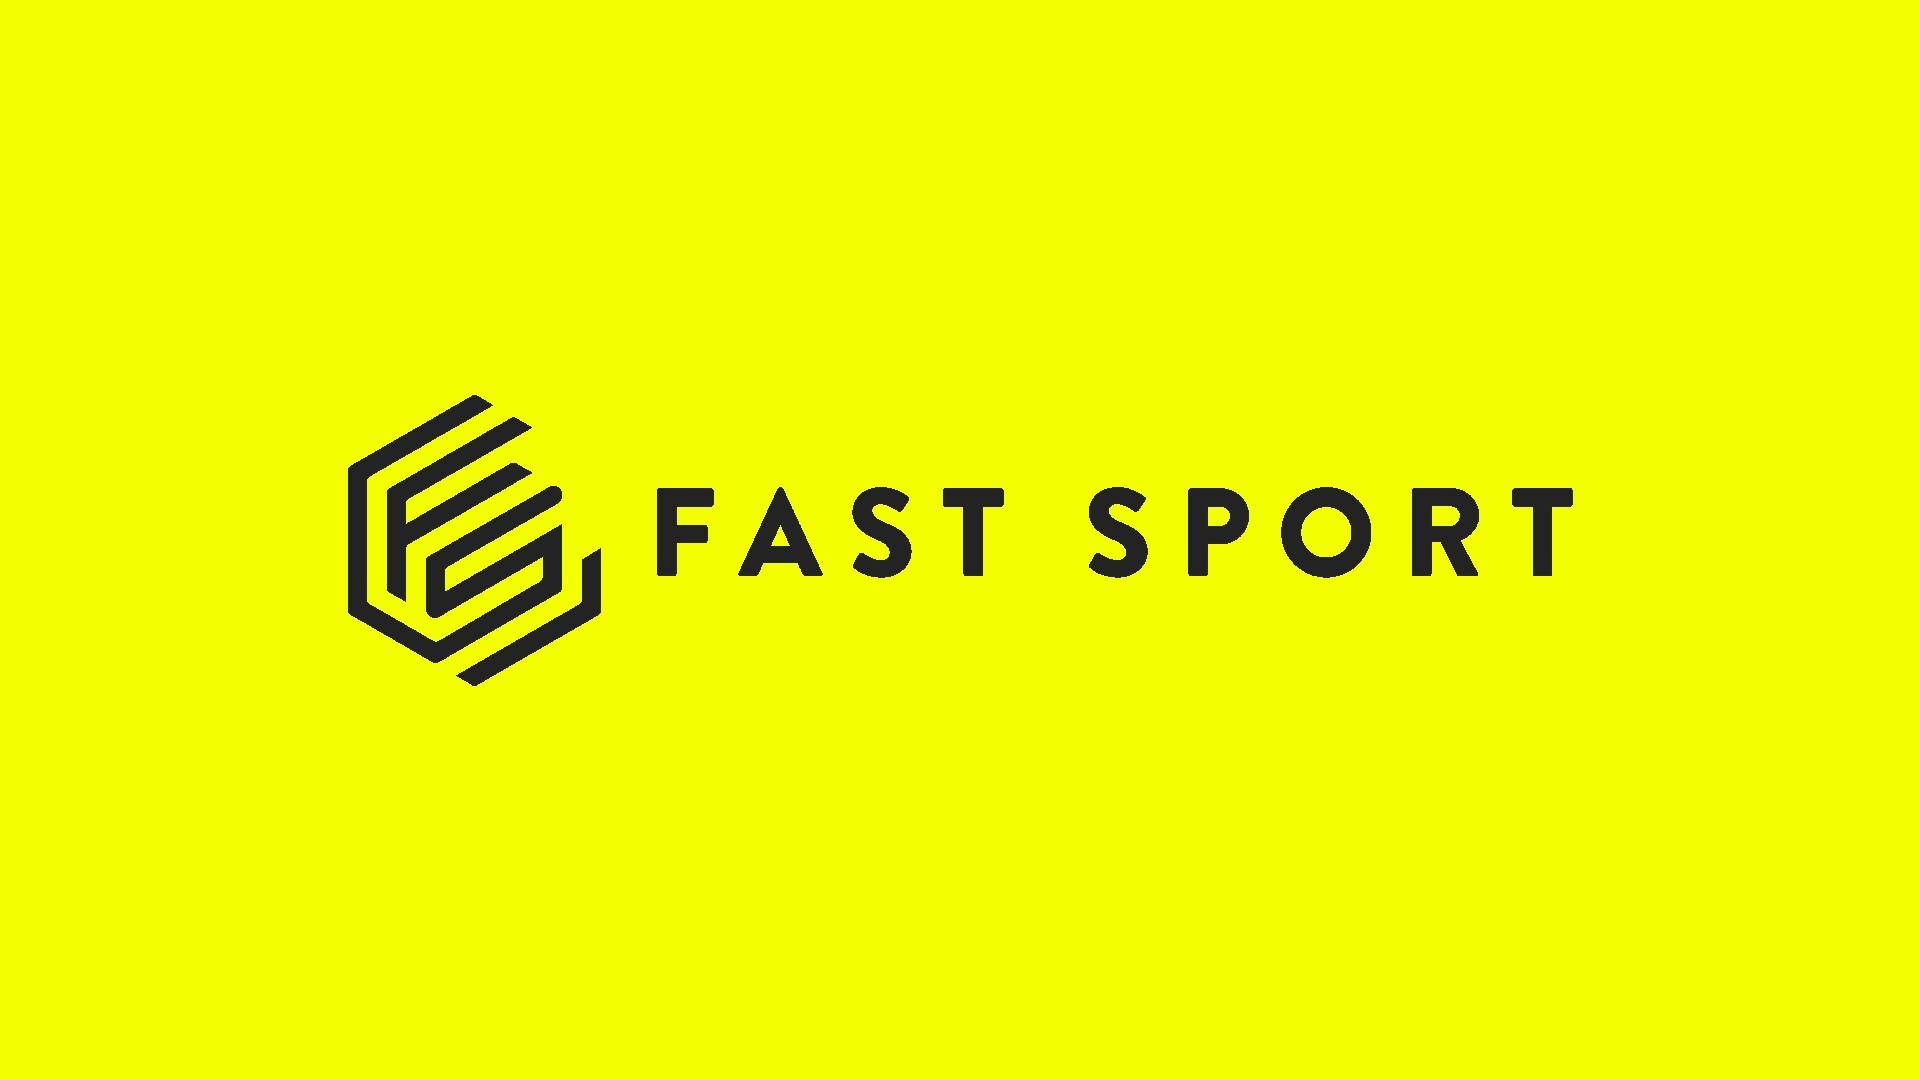 FAst Sport (1) Logo